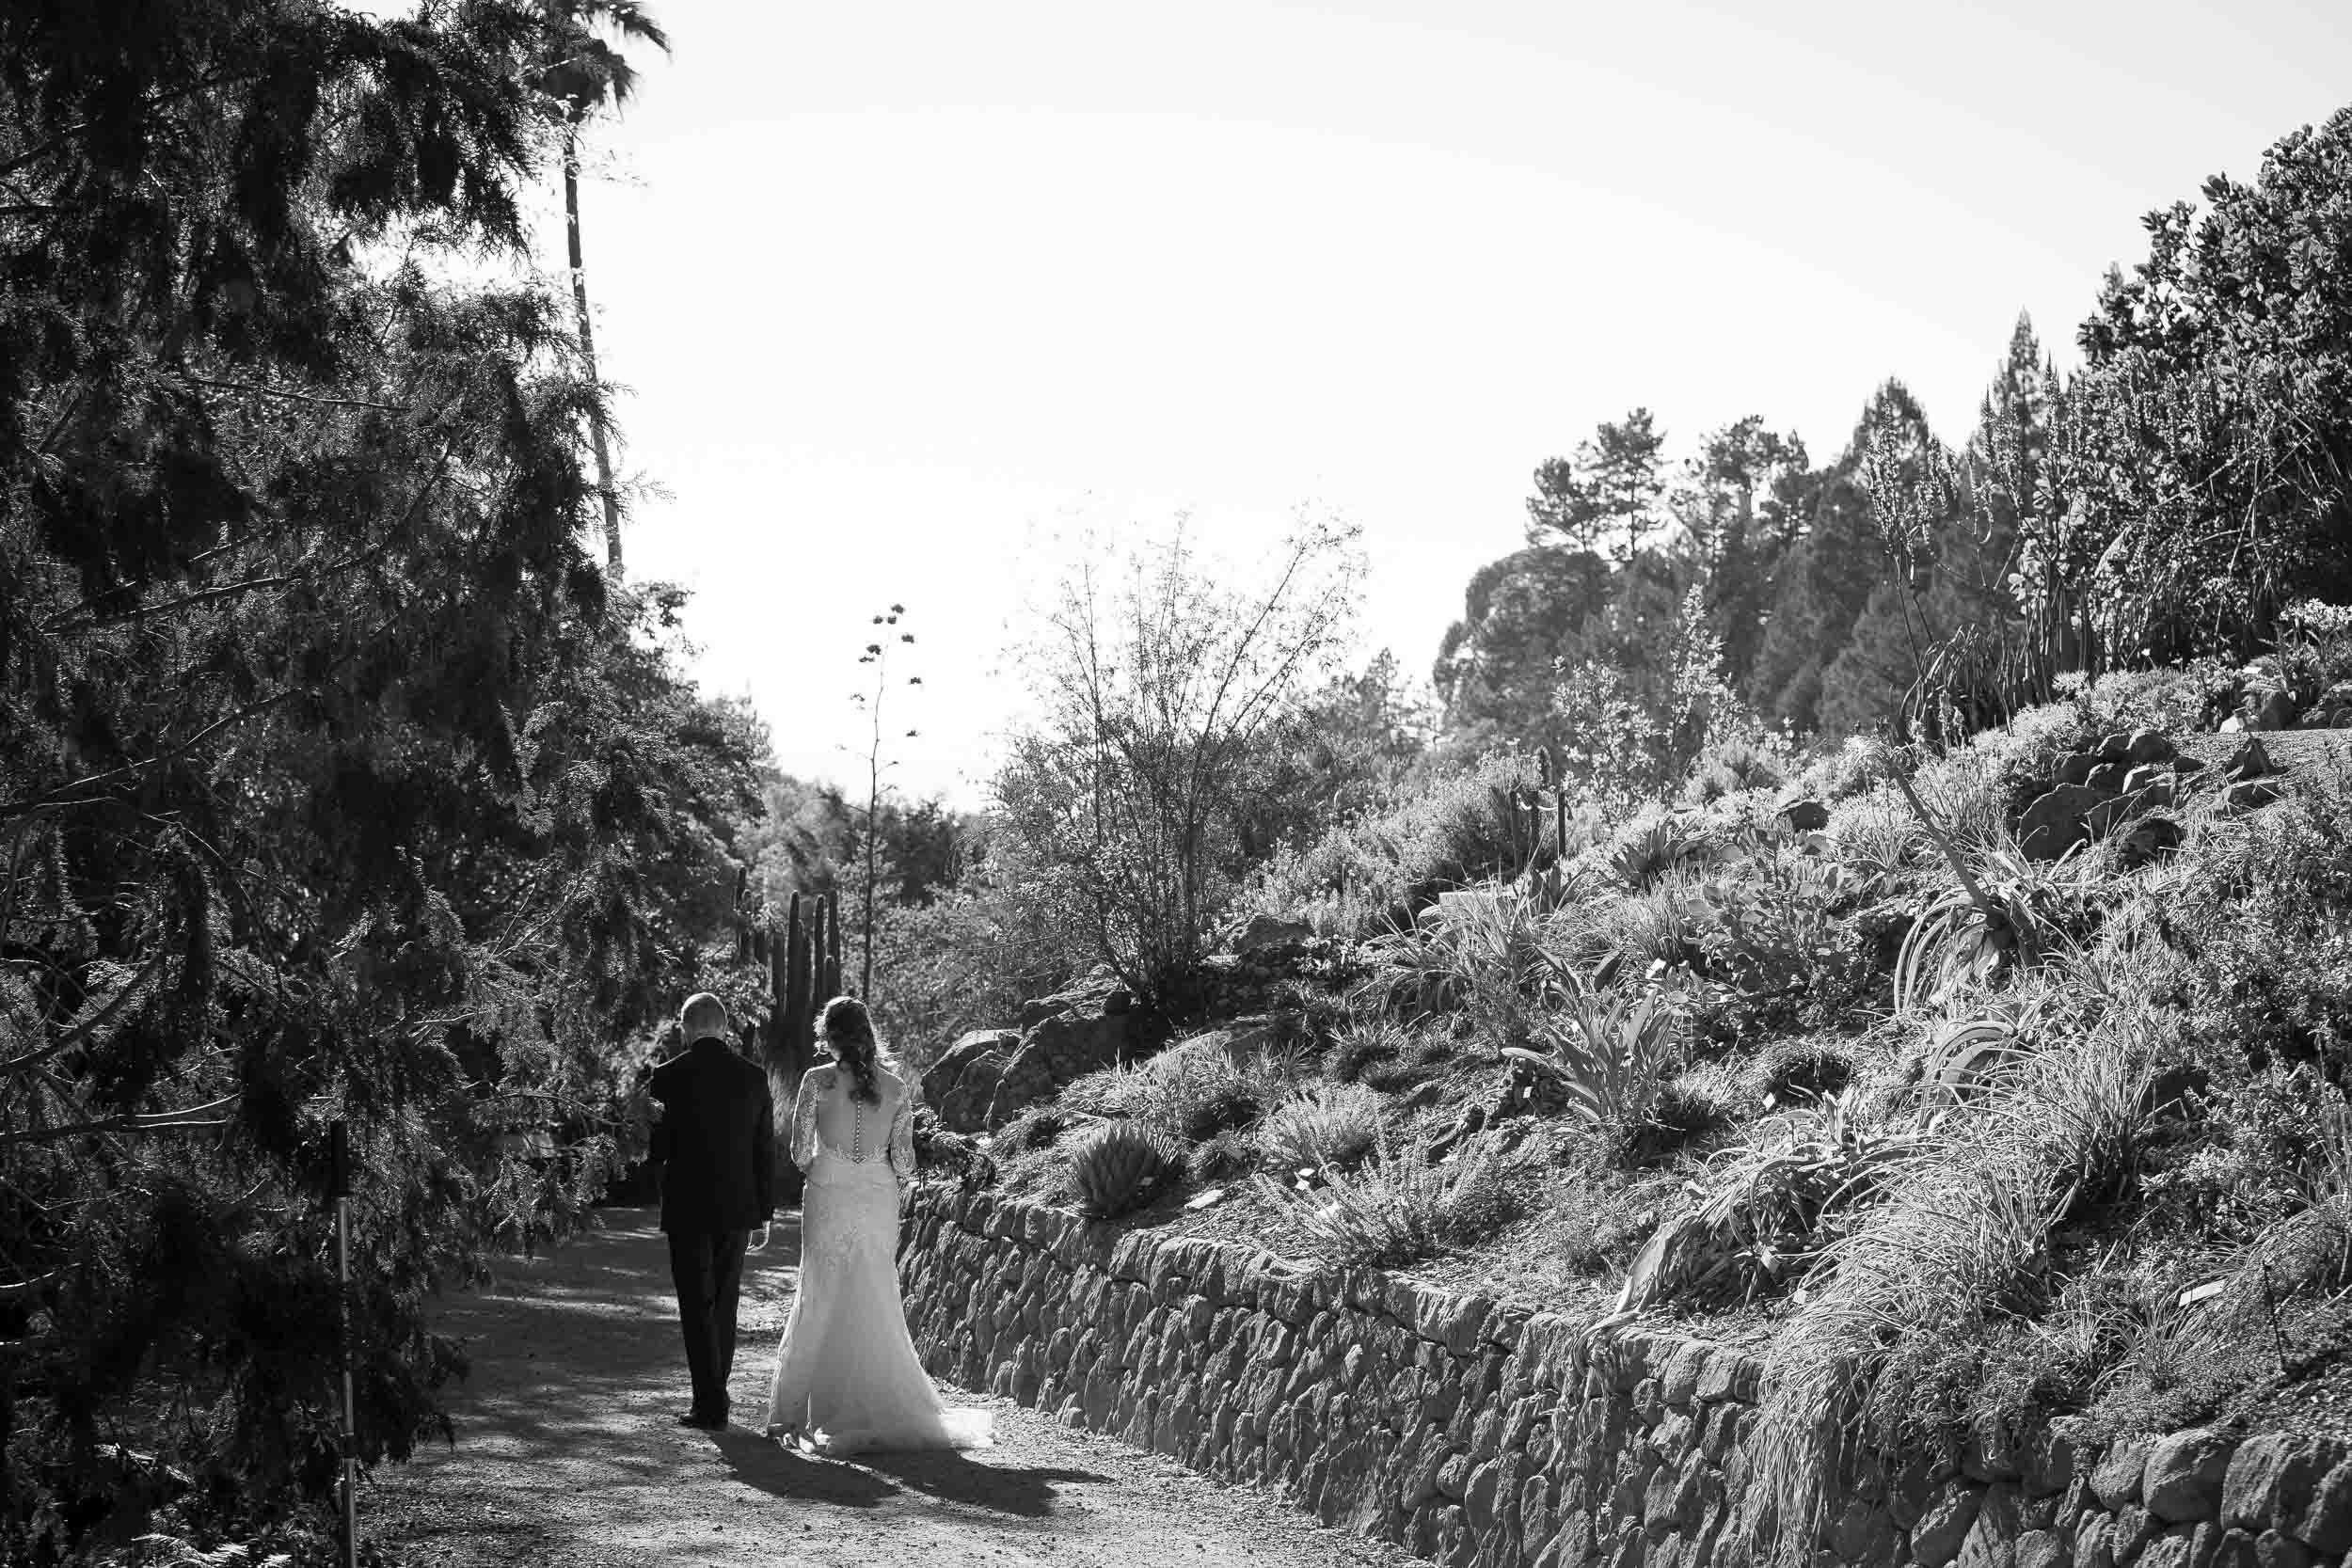 Berkeley Botanical Garden Wedding Ceremony in the Redwood Grove Ceremony and SF Bay Wedding Cruise Reception-60.jpg